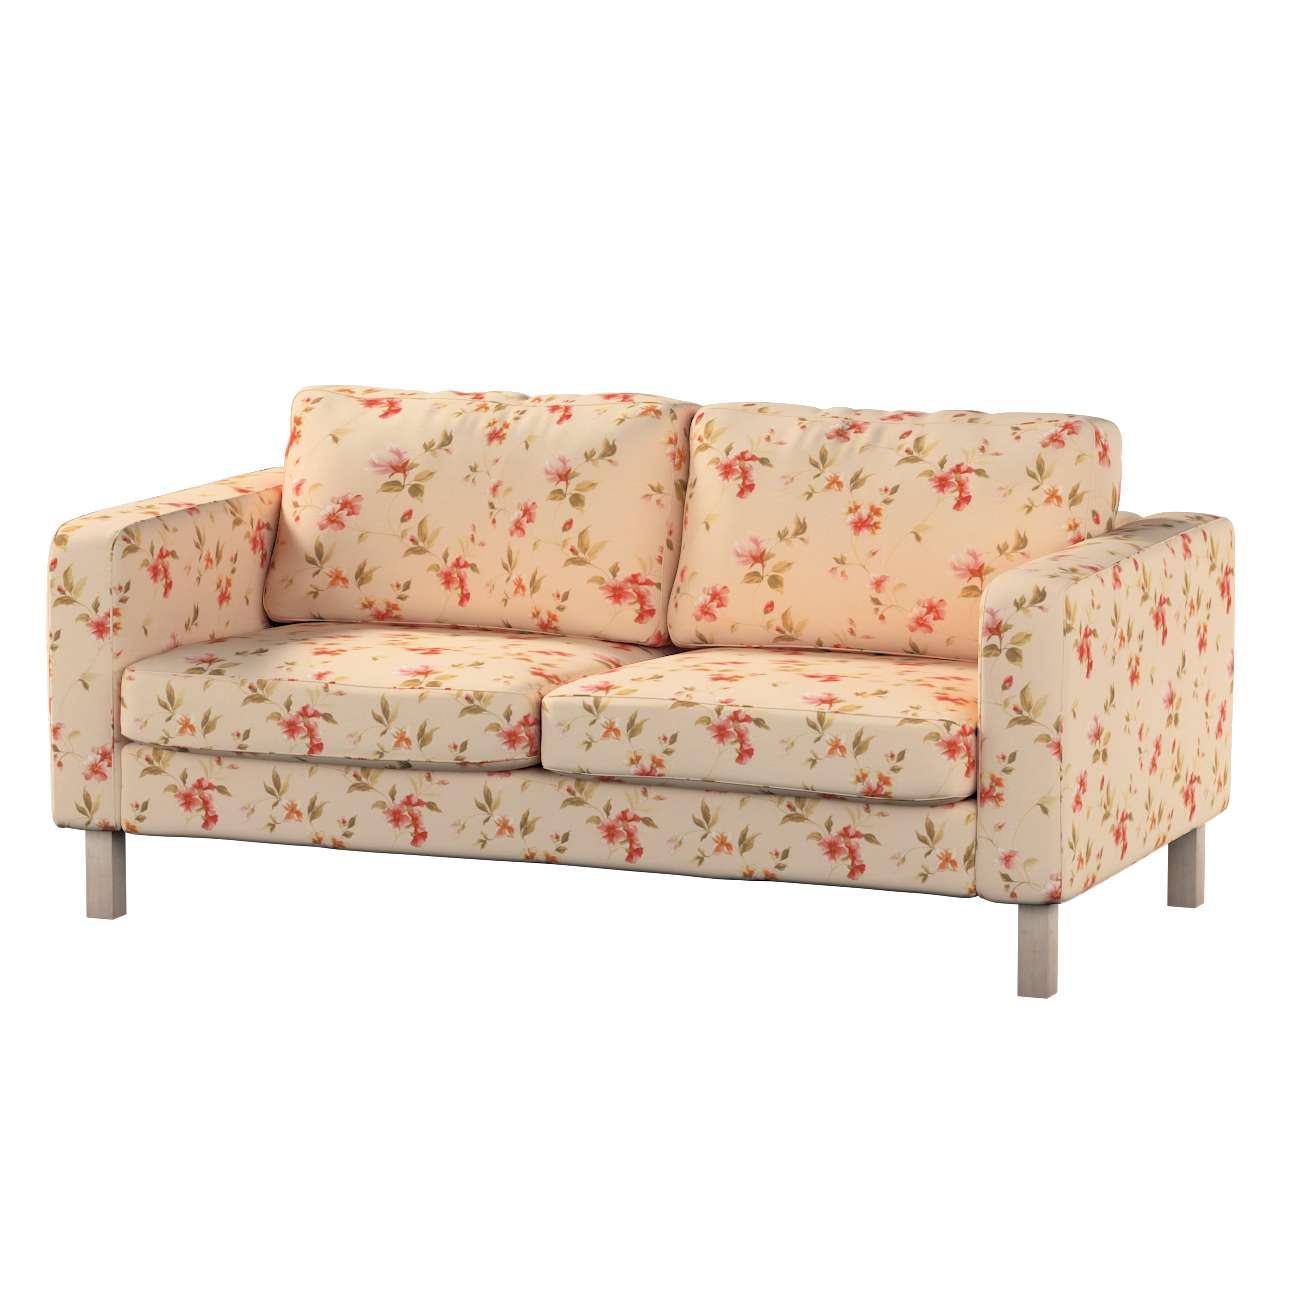 KARSLTAD dvivietės sofos užvalkalas Karlstad 2-vietės sofos užvalkalas kolekcijoje Londres, audinys: 124-05